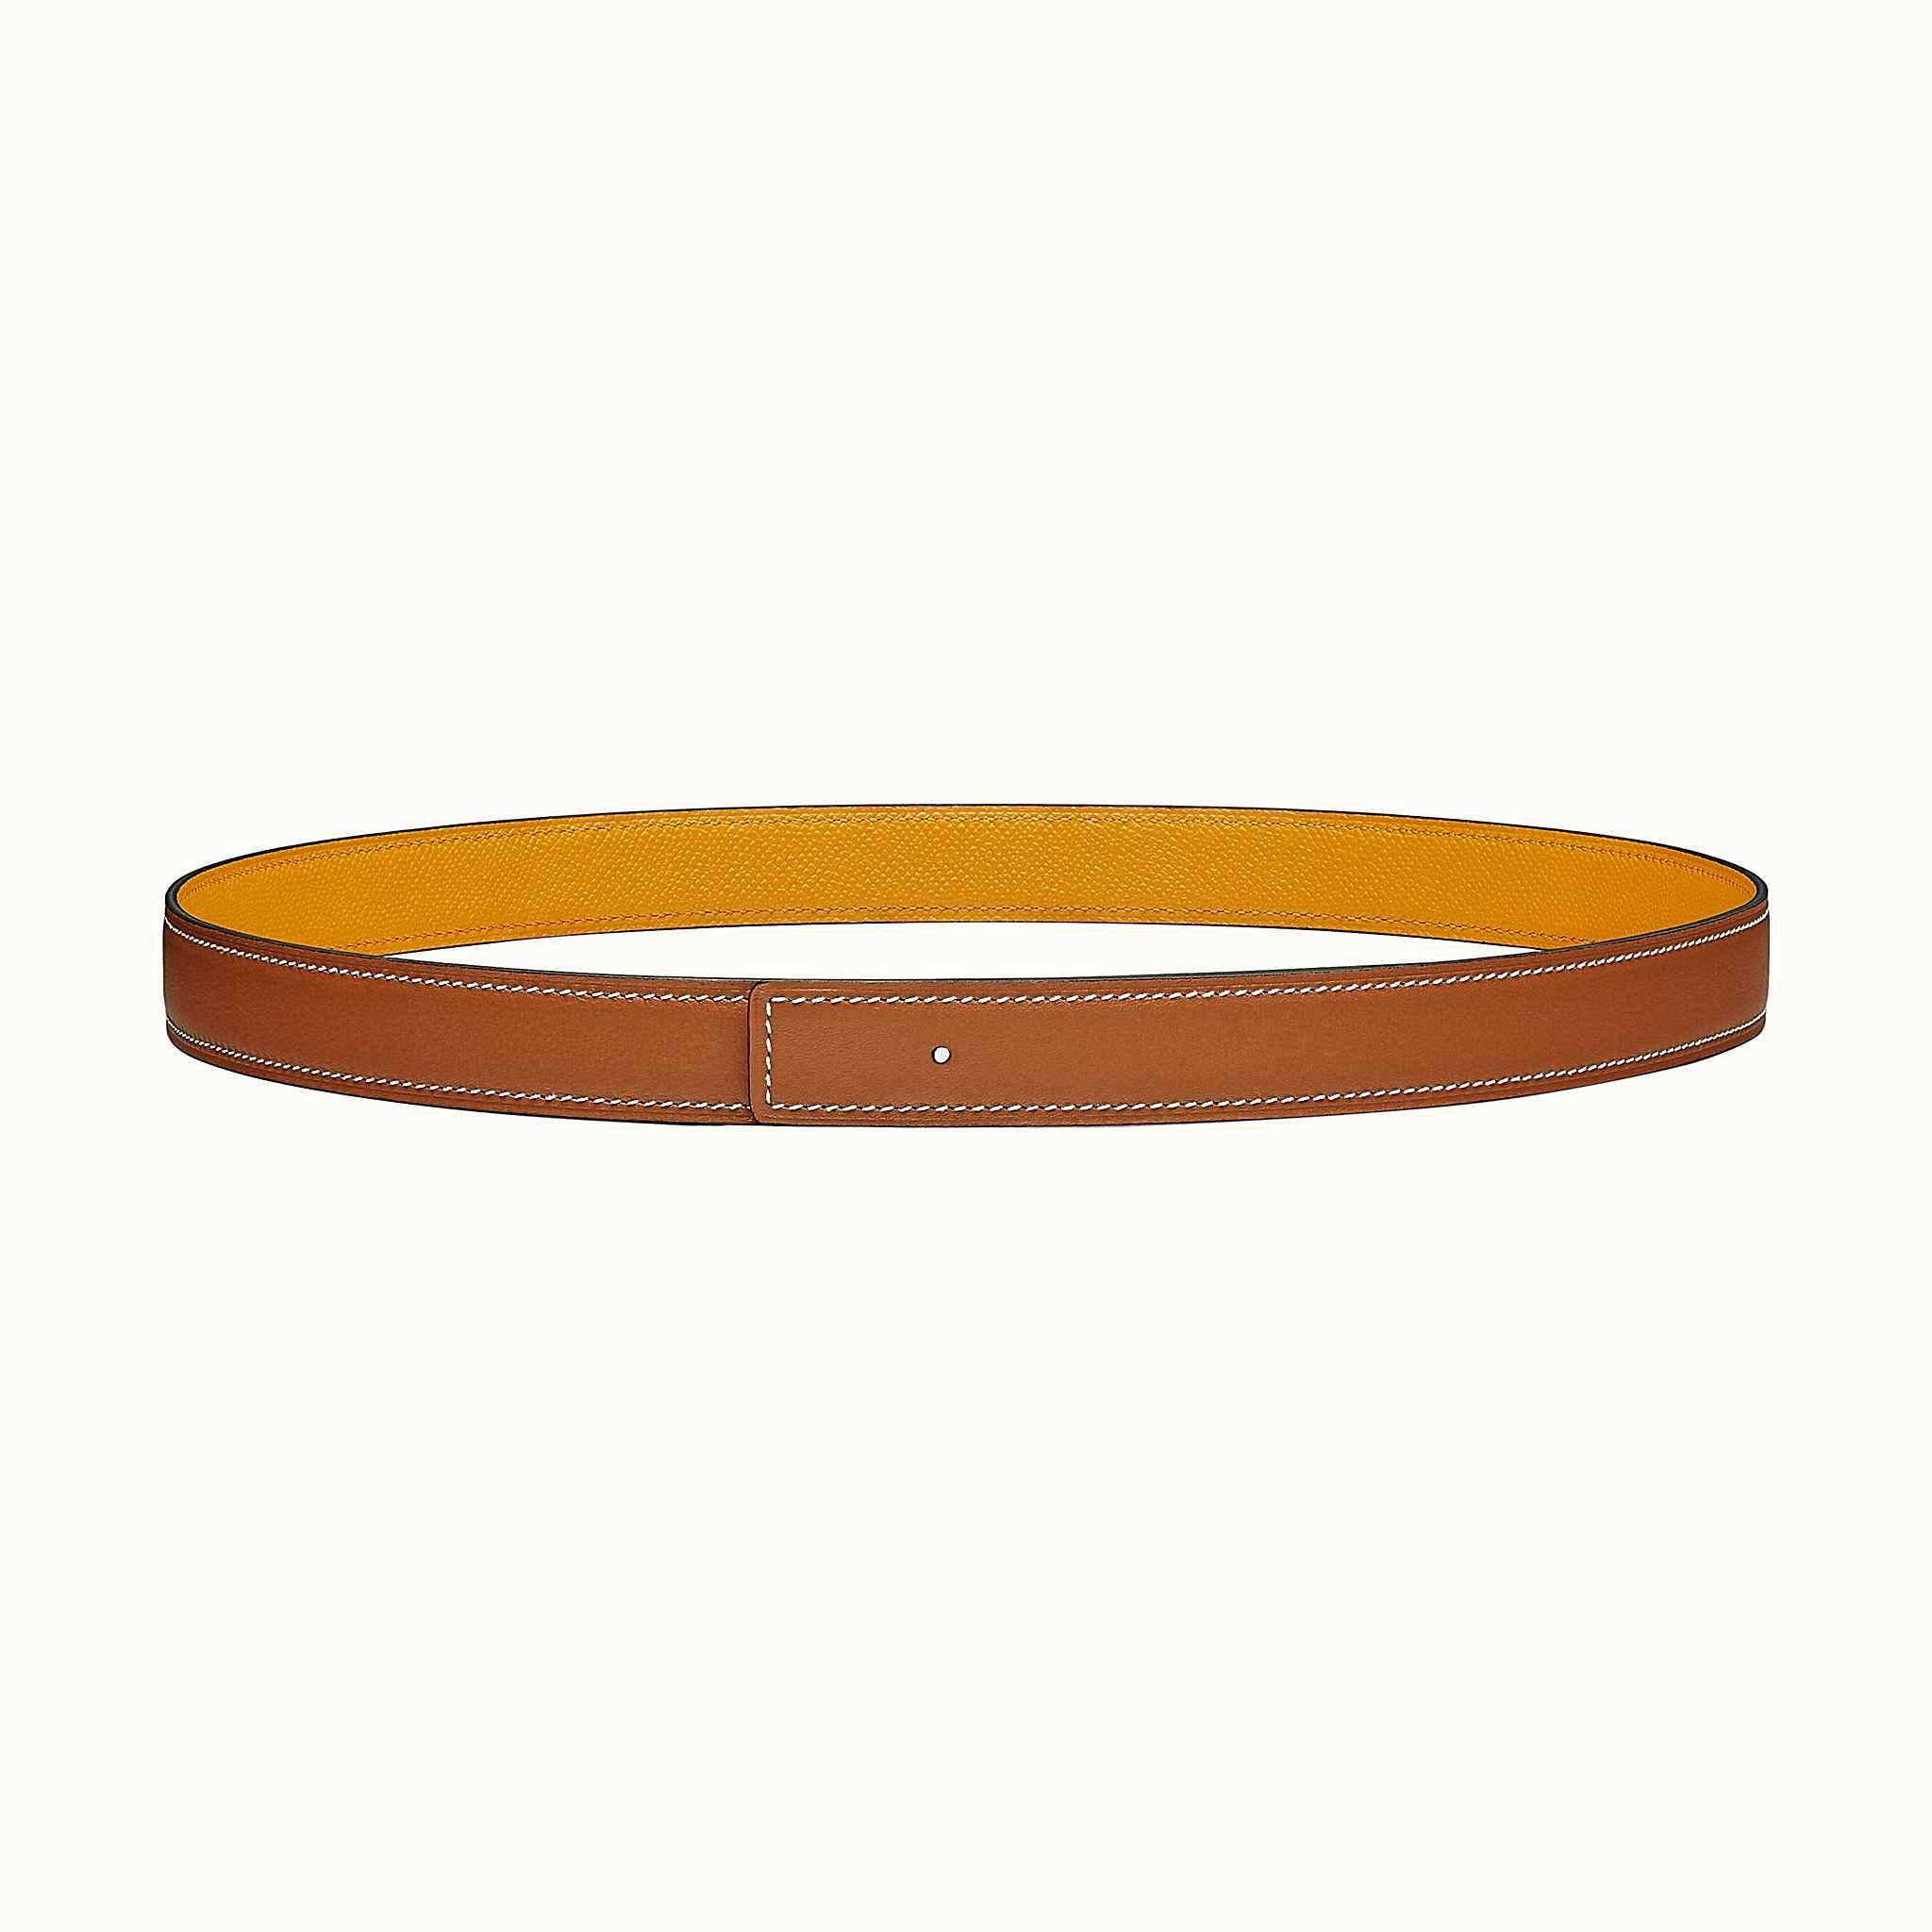 Cuir de ceinture réversible 24 mm   Hermès e6baa989818